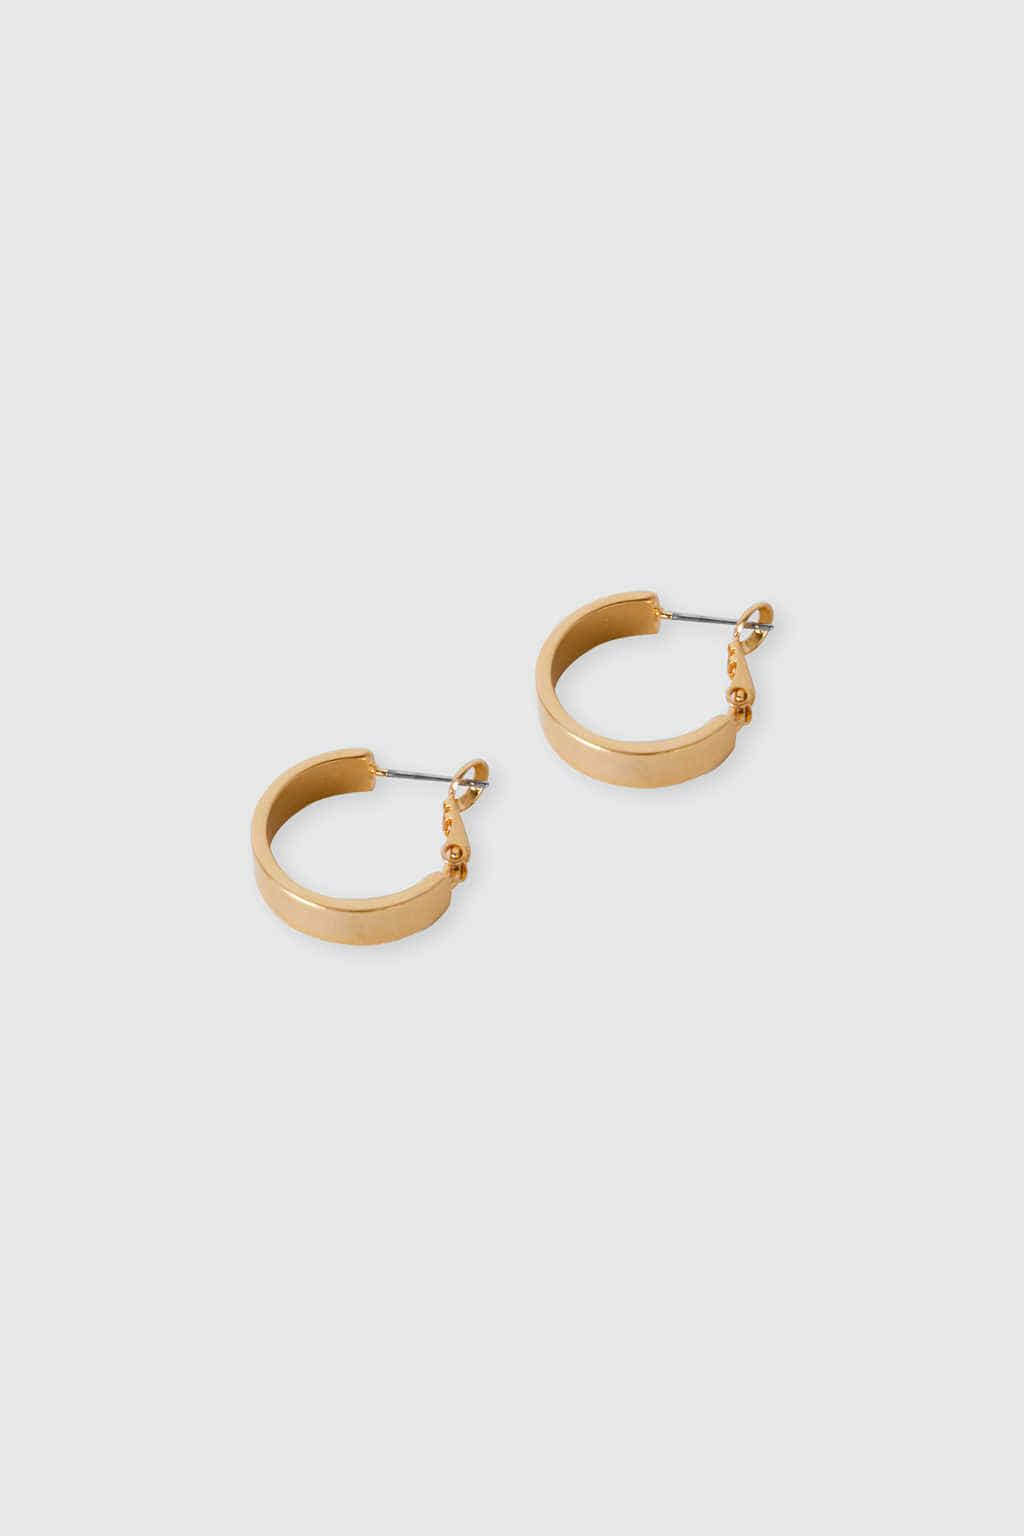 Earring J025 Gold 2